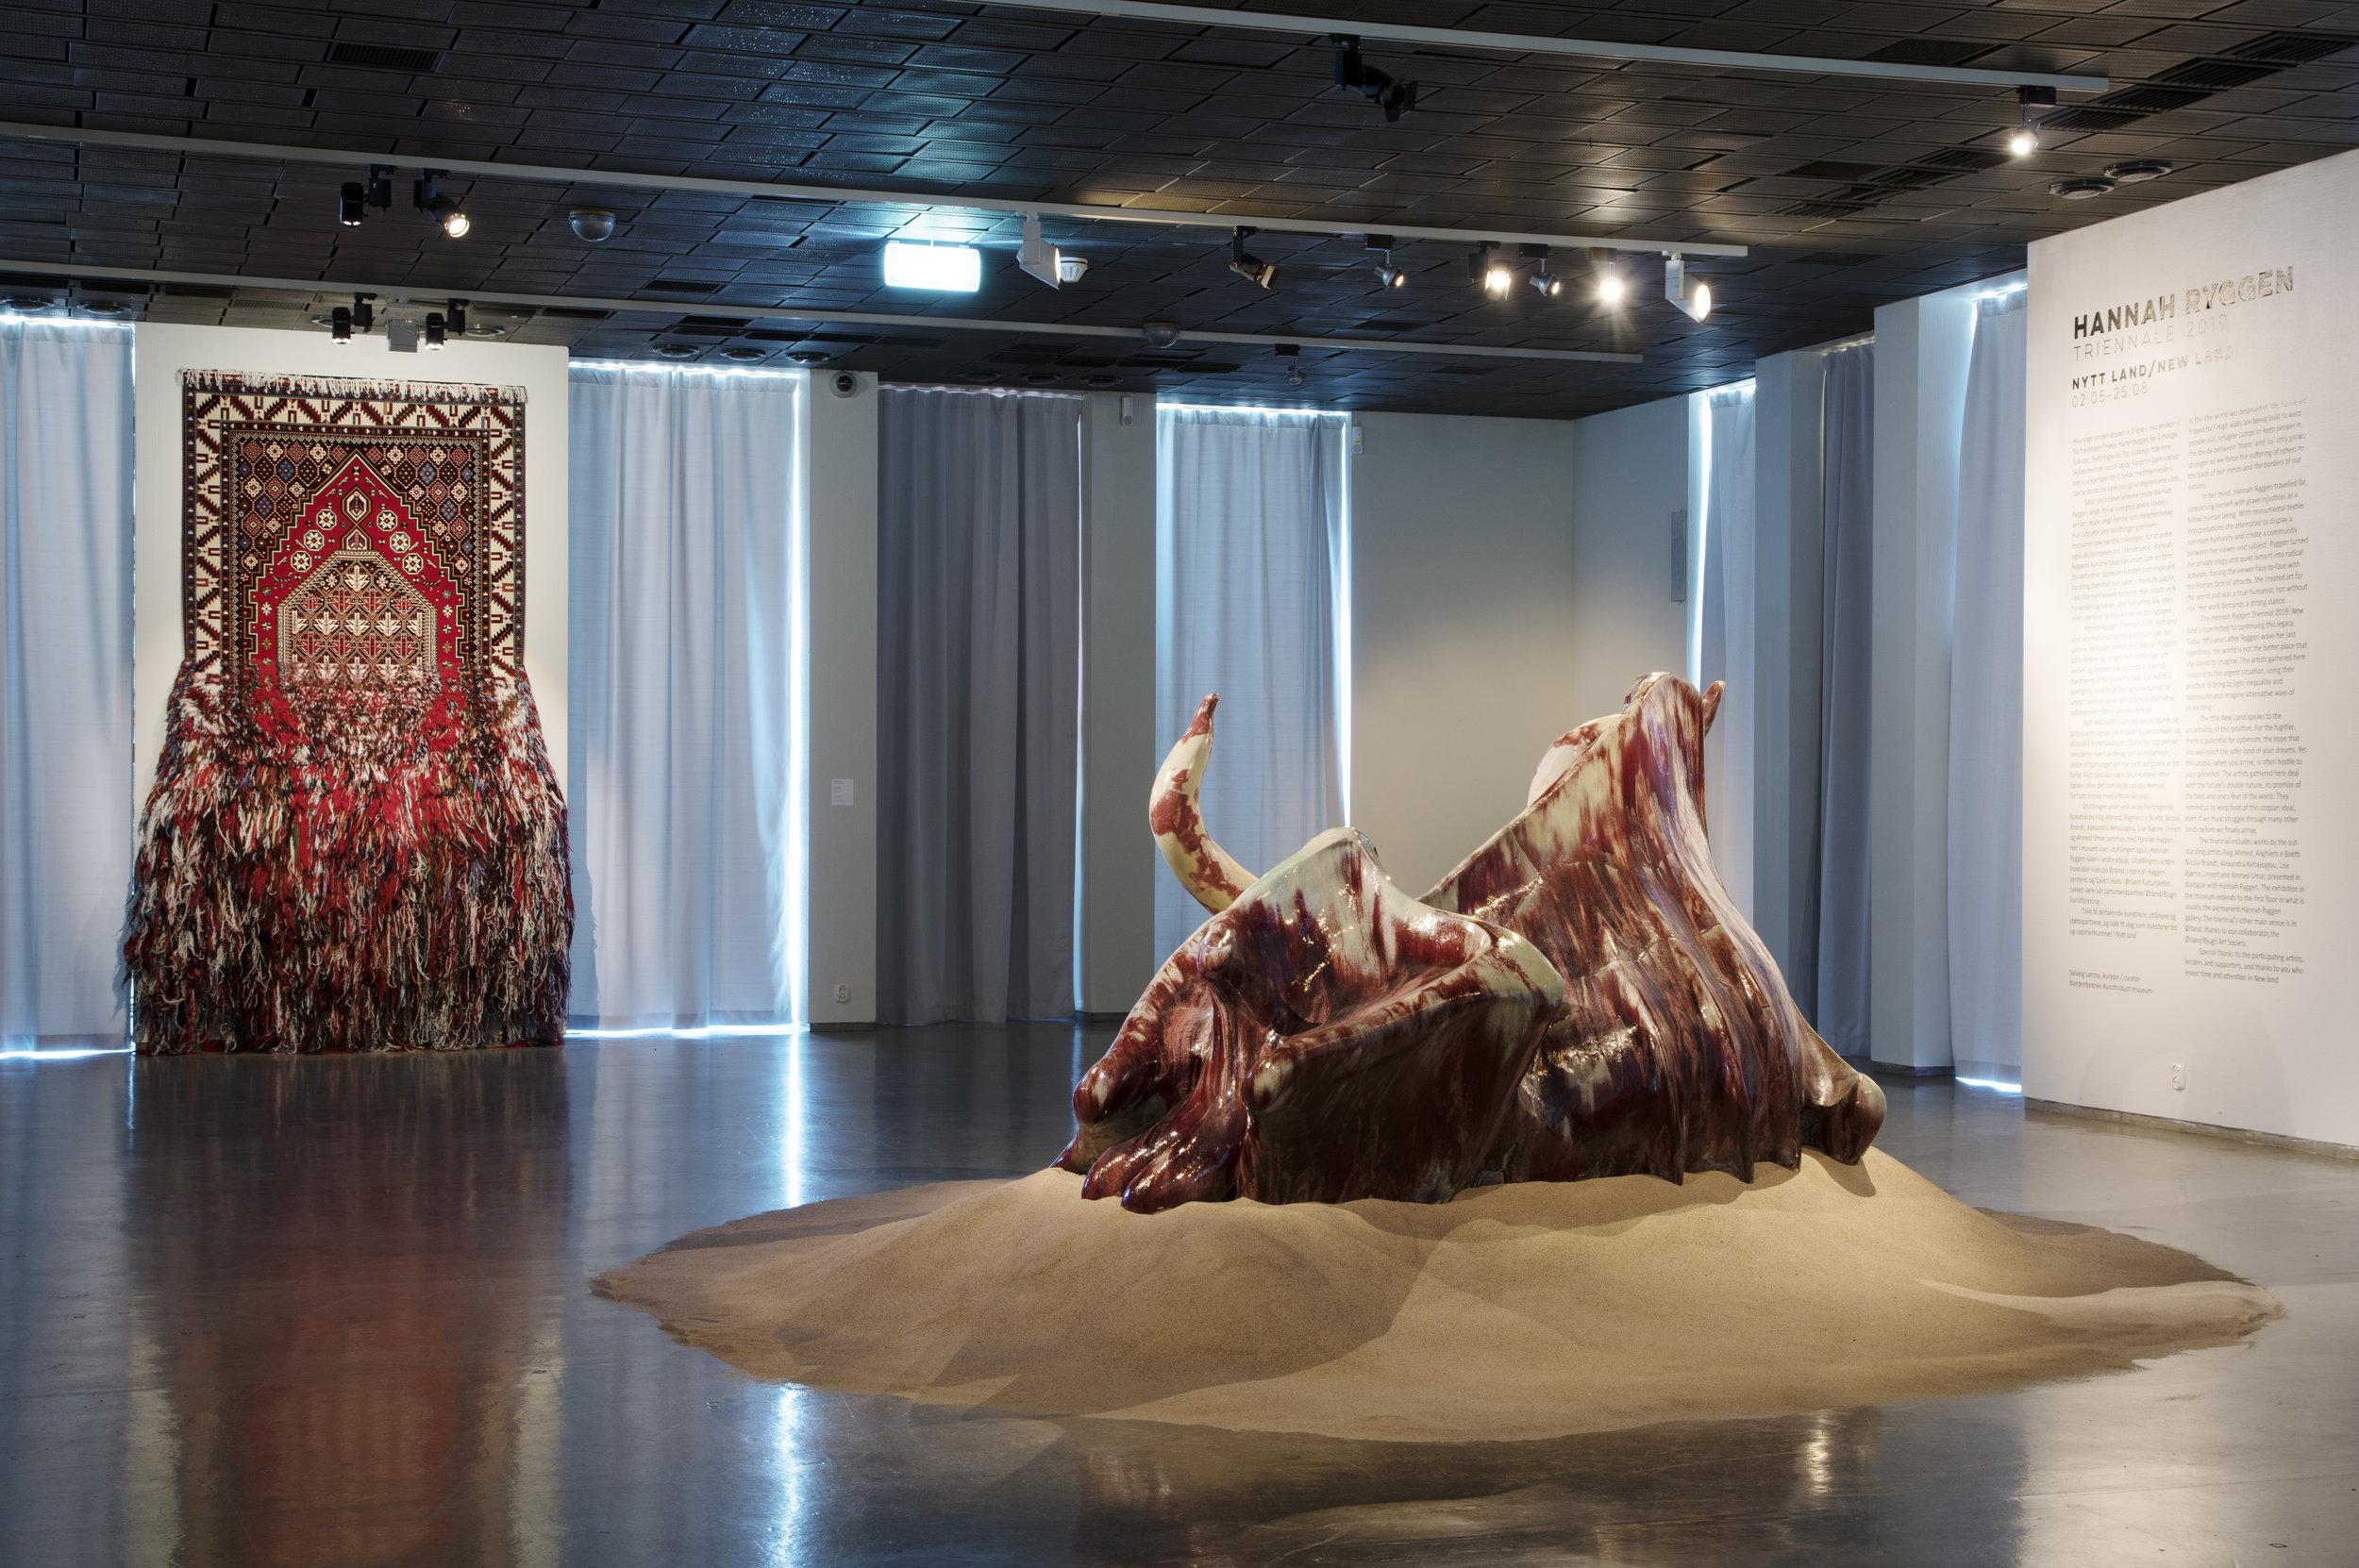 Hannah Ryggen Triennale 2019: Nytt land, Nordenfjeldske Kunstindustrimuseum. Faig Ahmed,  Gobustan , 2017 og Ahmed Umar,  Thawr, Thawra  ثور, ثورة ( Ox, revolution ), 2014. Foto: Dag-Arve Forbergskog